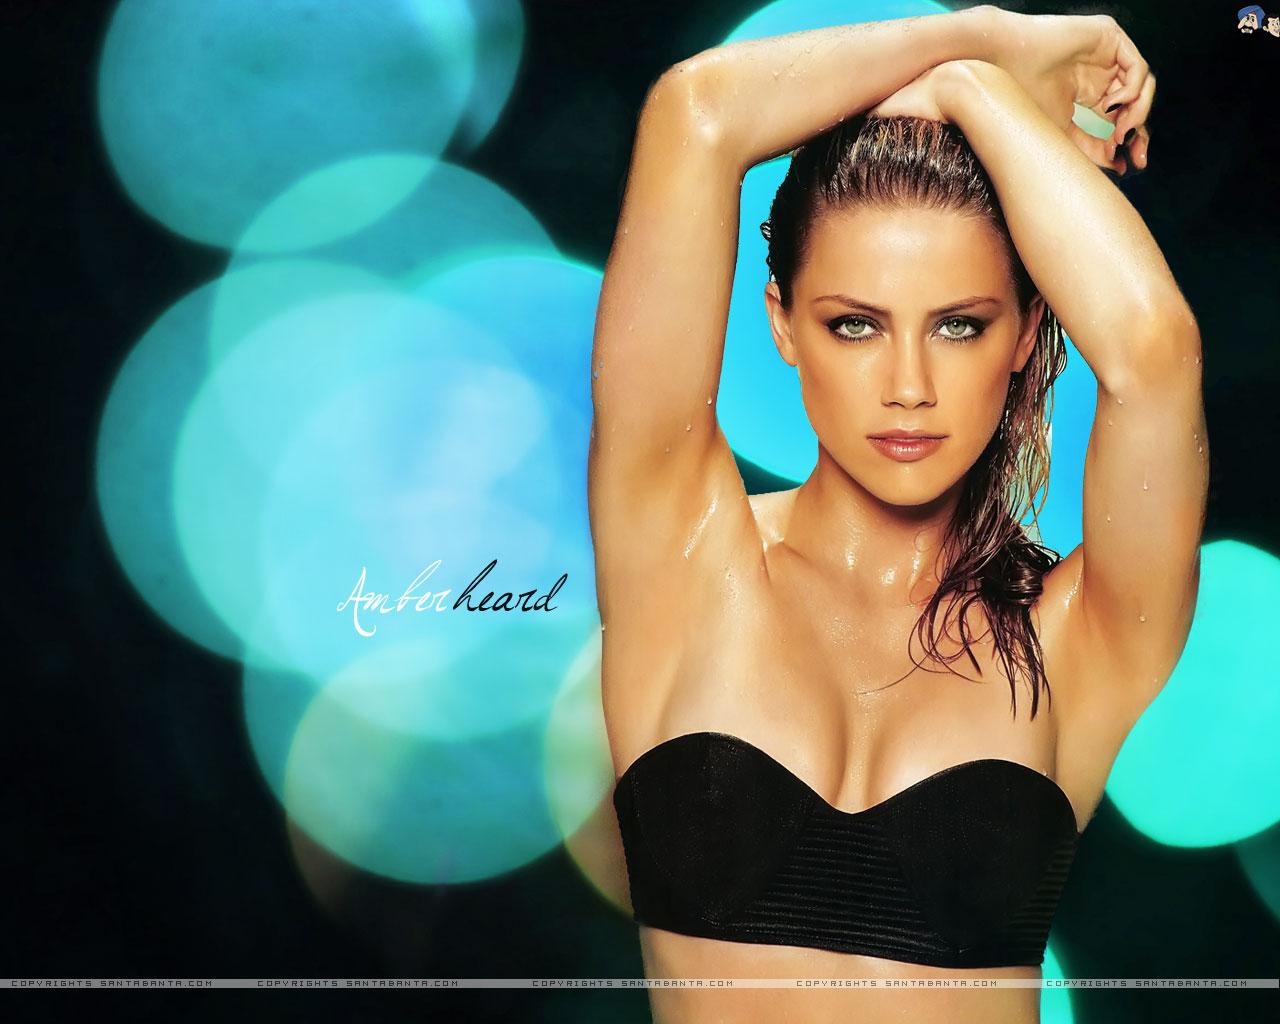 http://3.bp.blogspot.com/-4sI285dheEA/T-oQctl0MsI/AAAAAAAAAzg/MJ1B-JHywZk/s1600/Amber_Heard.jpg